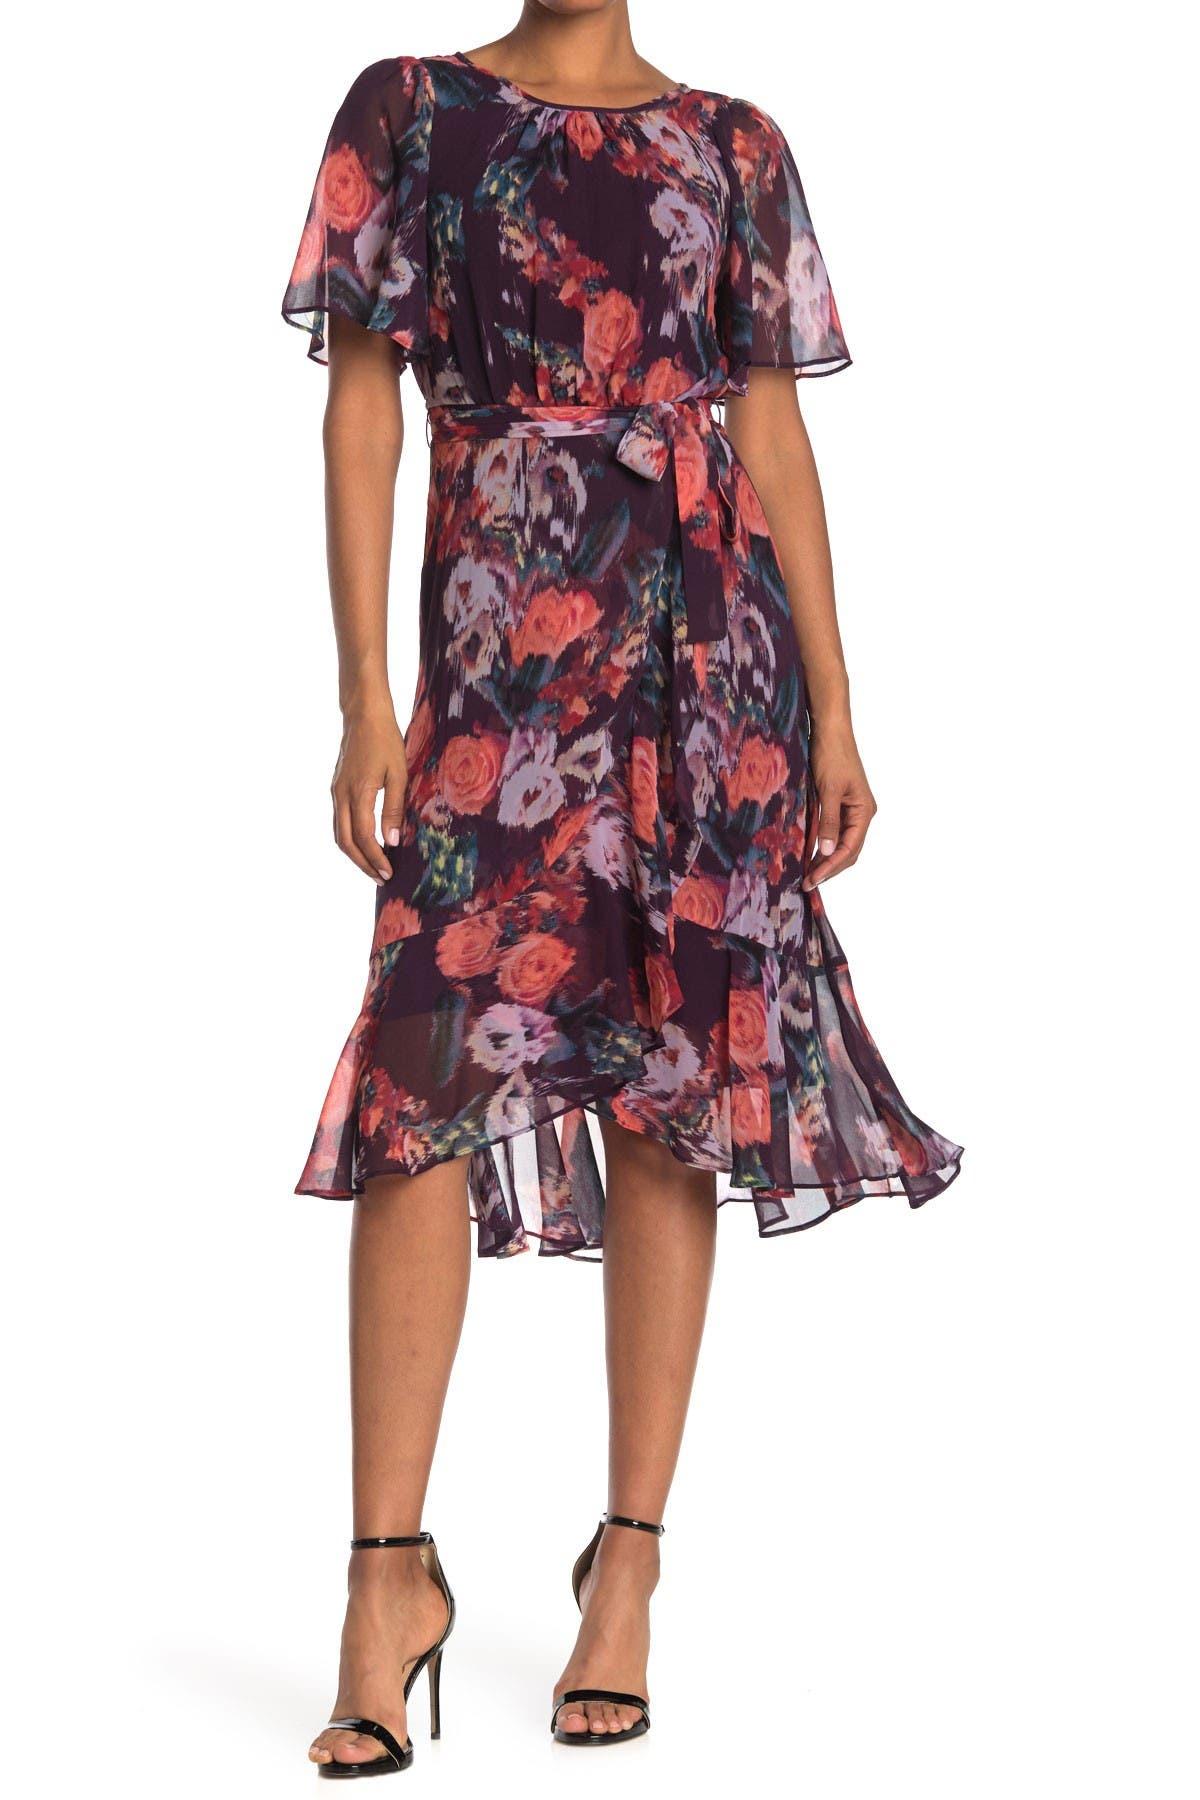 Gabby Skye Womens Plus Size Flutter Sleeve Floral Belted Dress